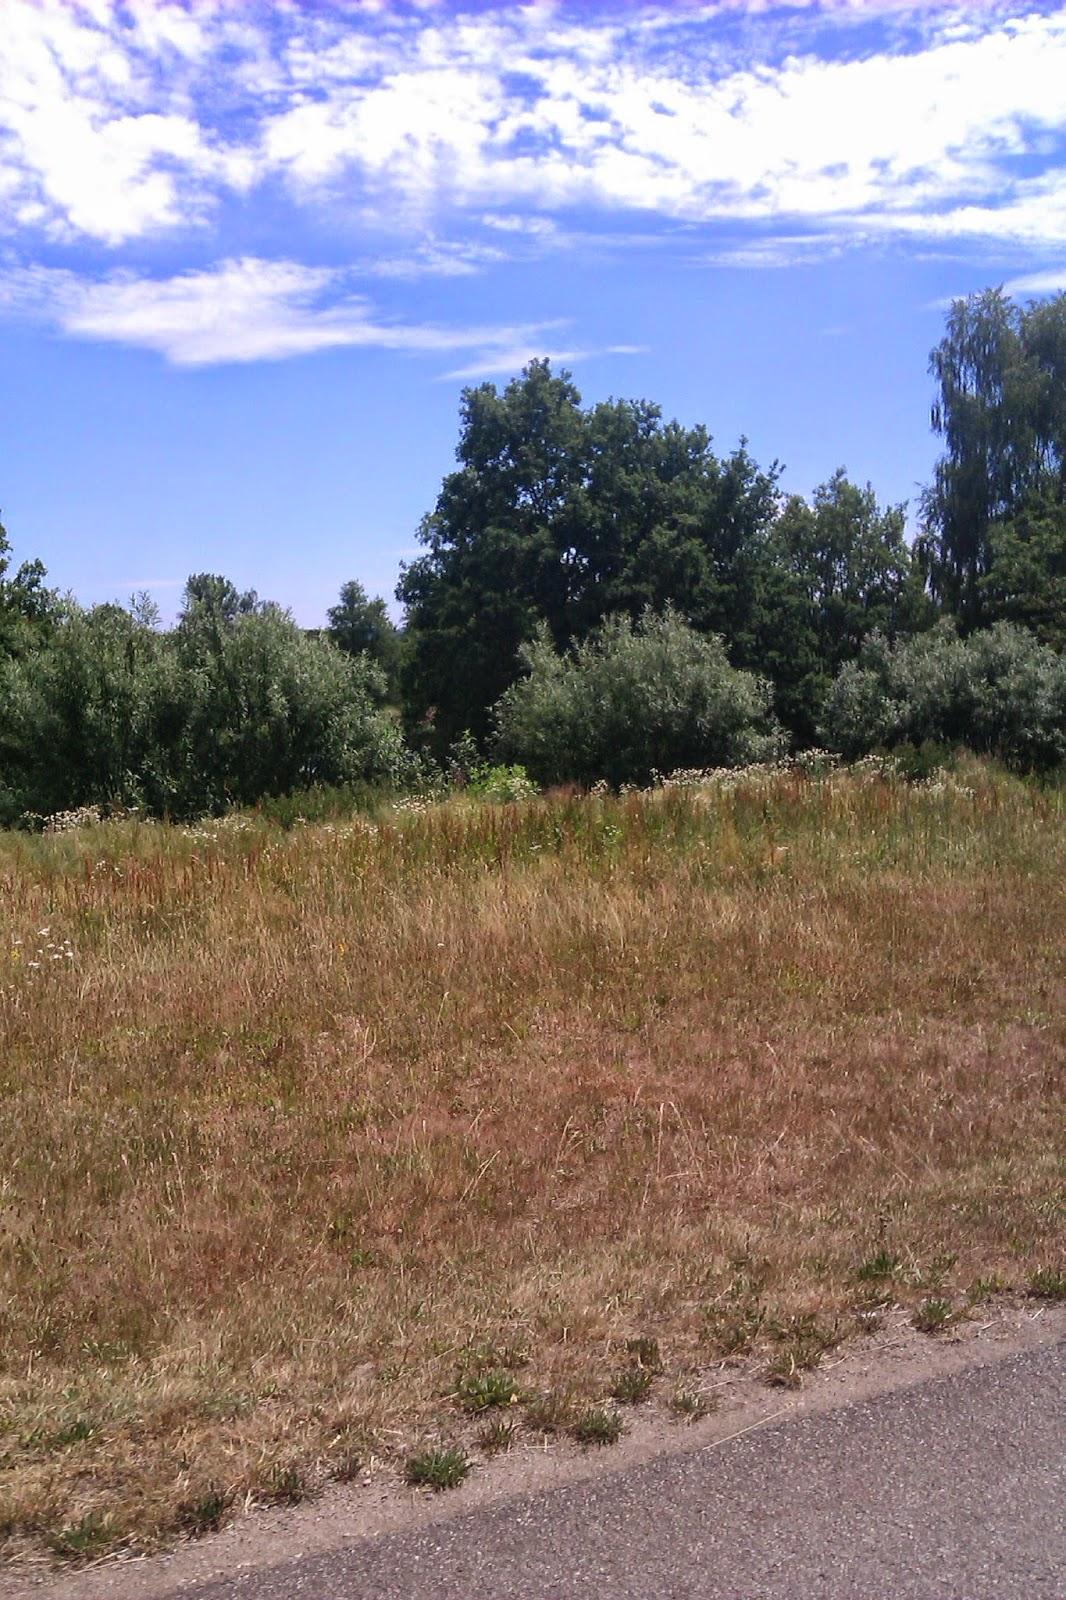 Natur in Nabburg fast da